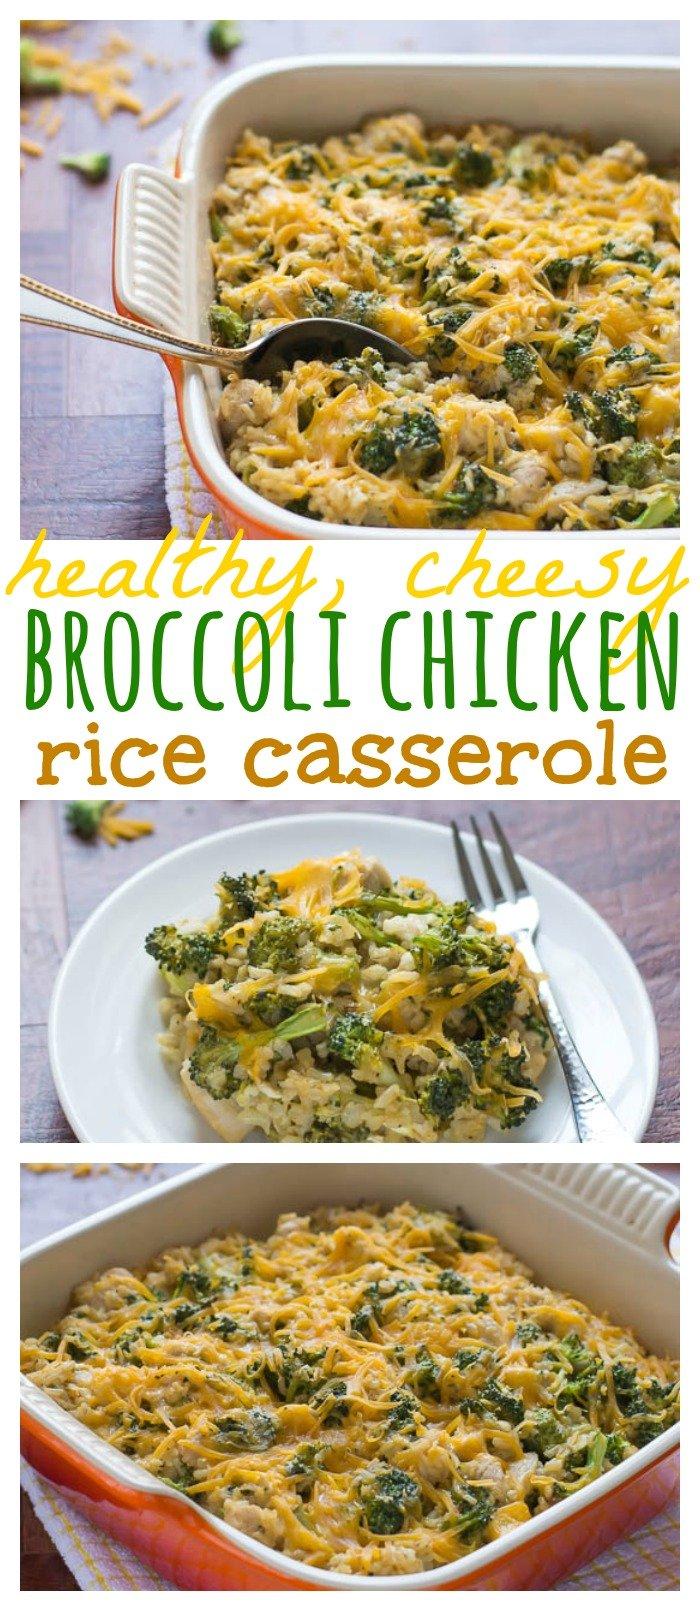 Healthy, Cheesy Broccoli Chicken Rice Casserole // Well-Plated